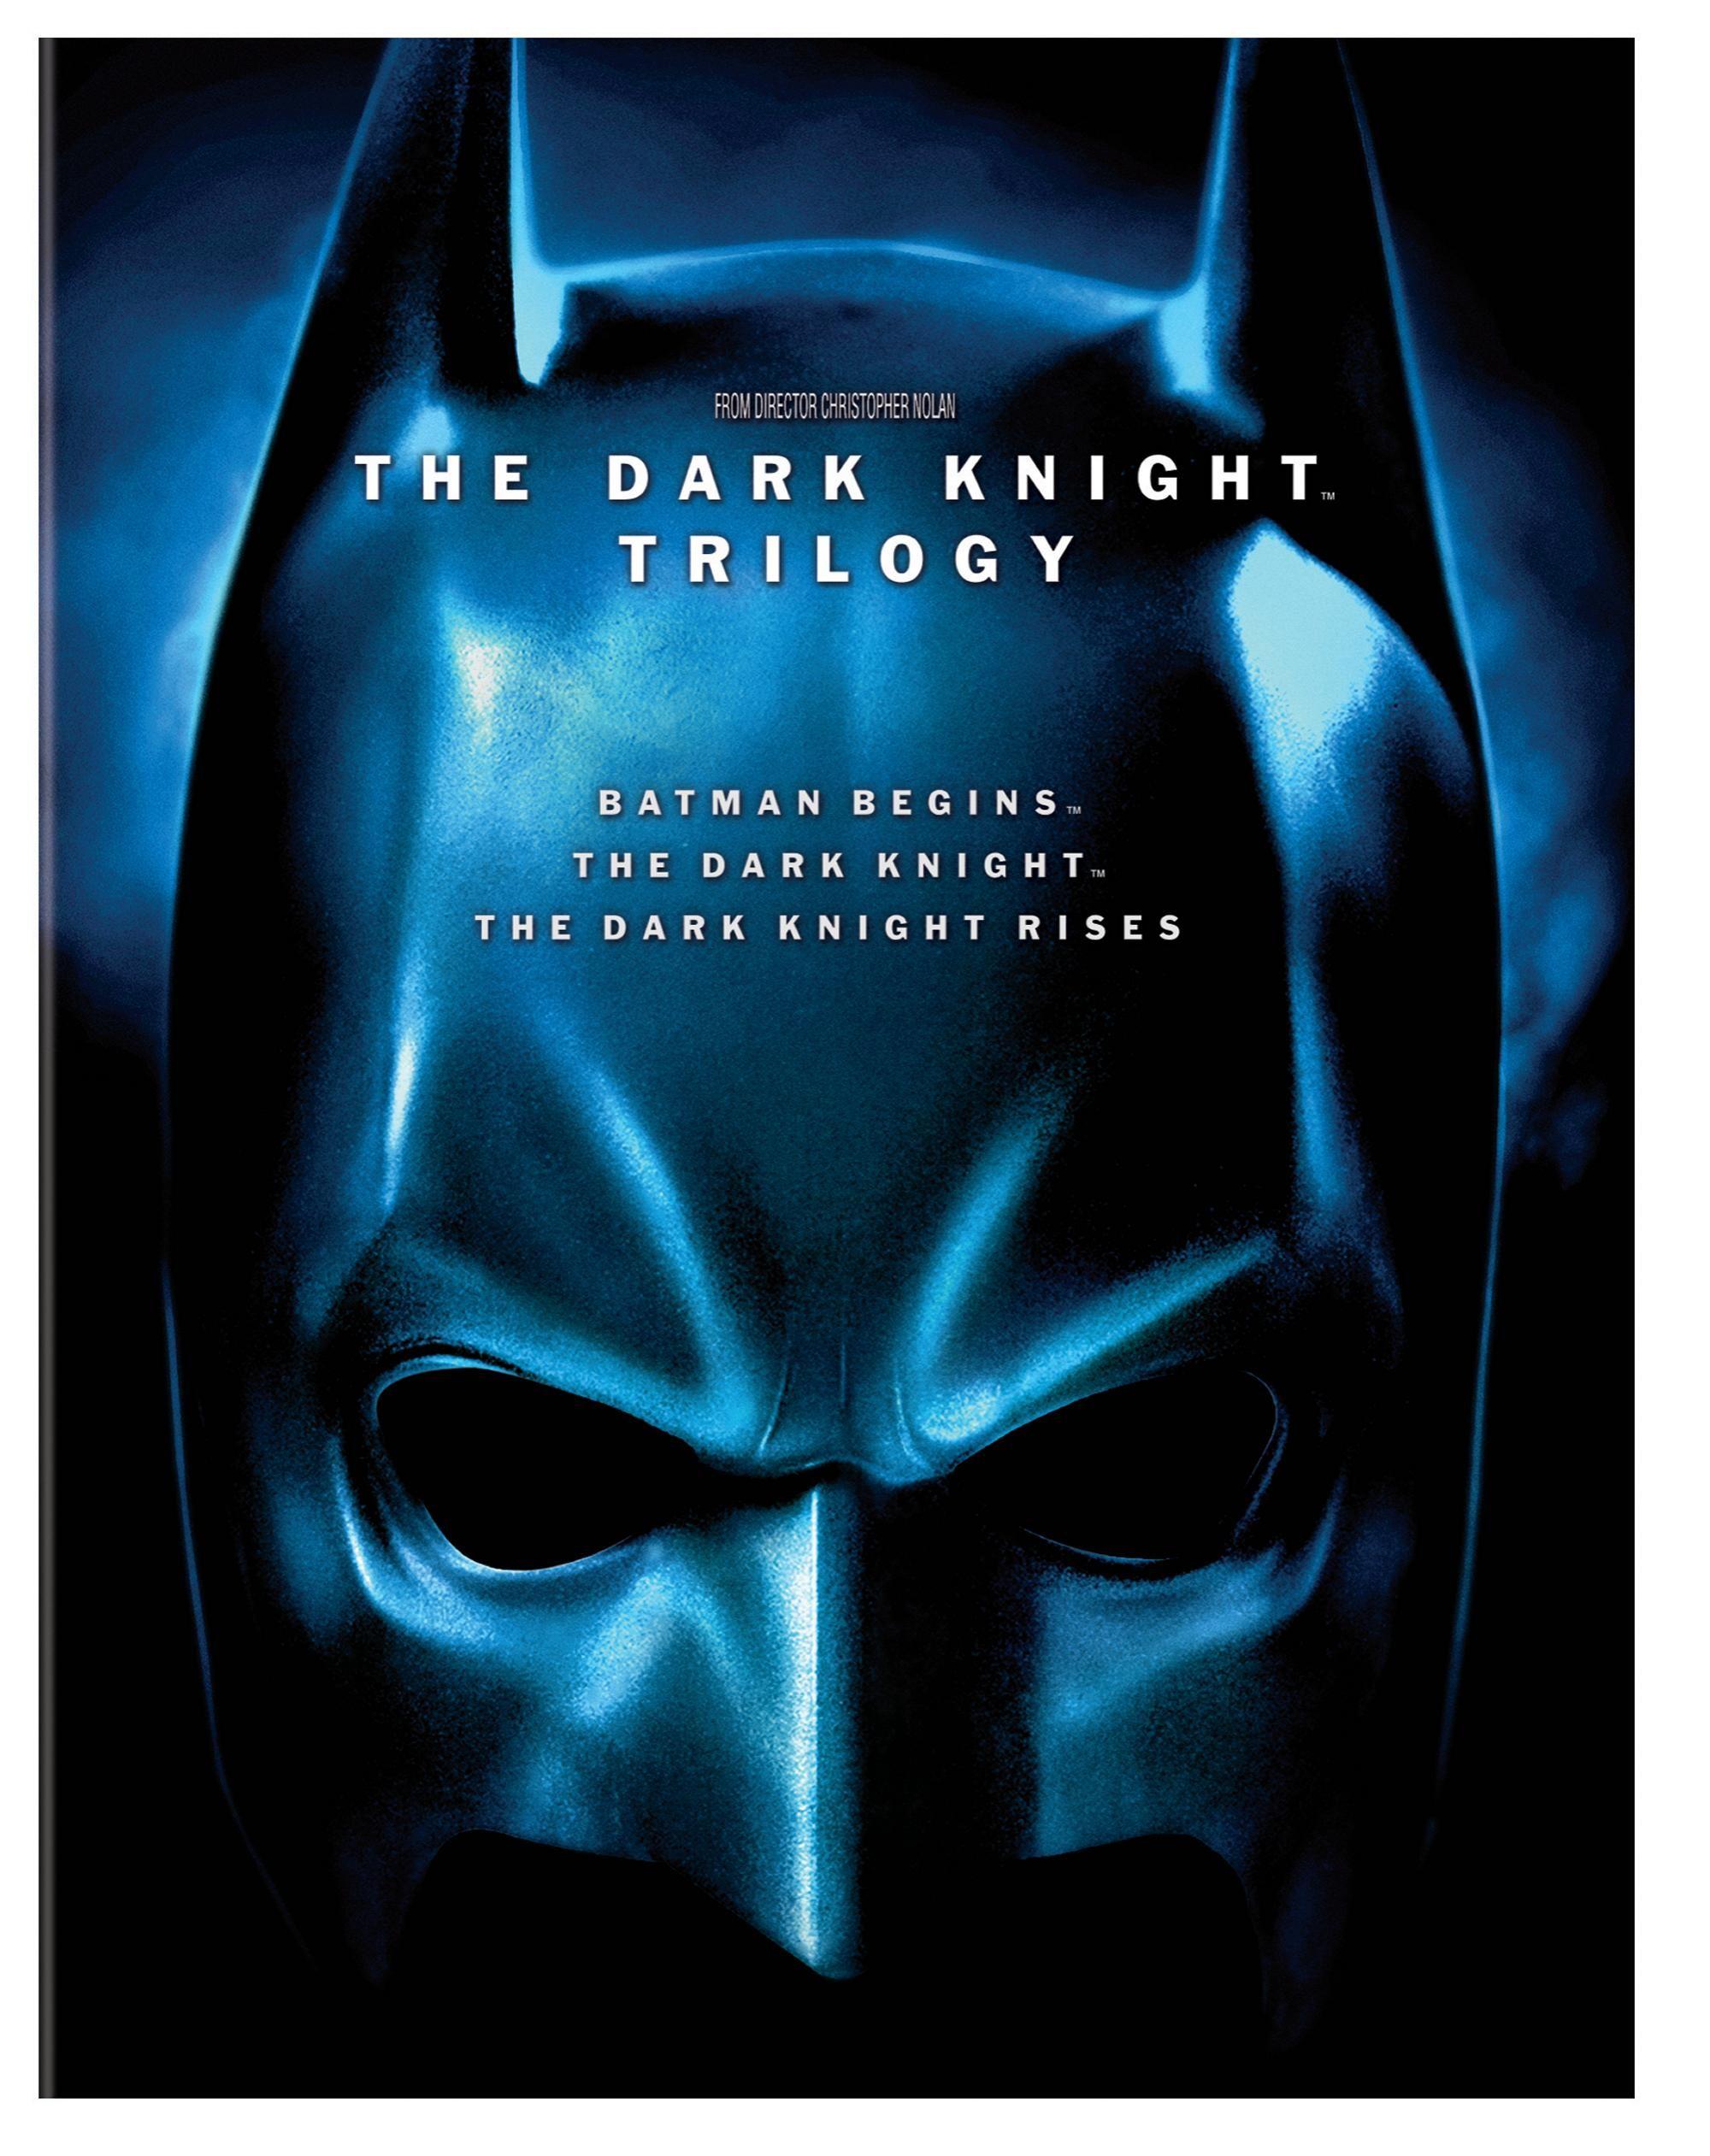 the dark knight film essay essay about why should we hire you the dark knight film essay